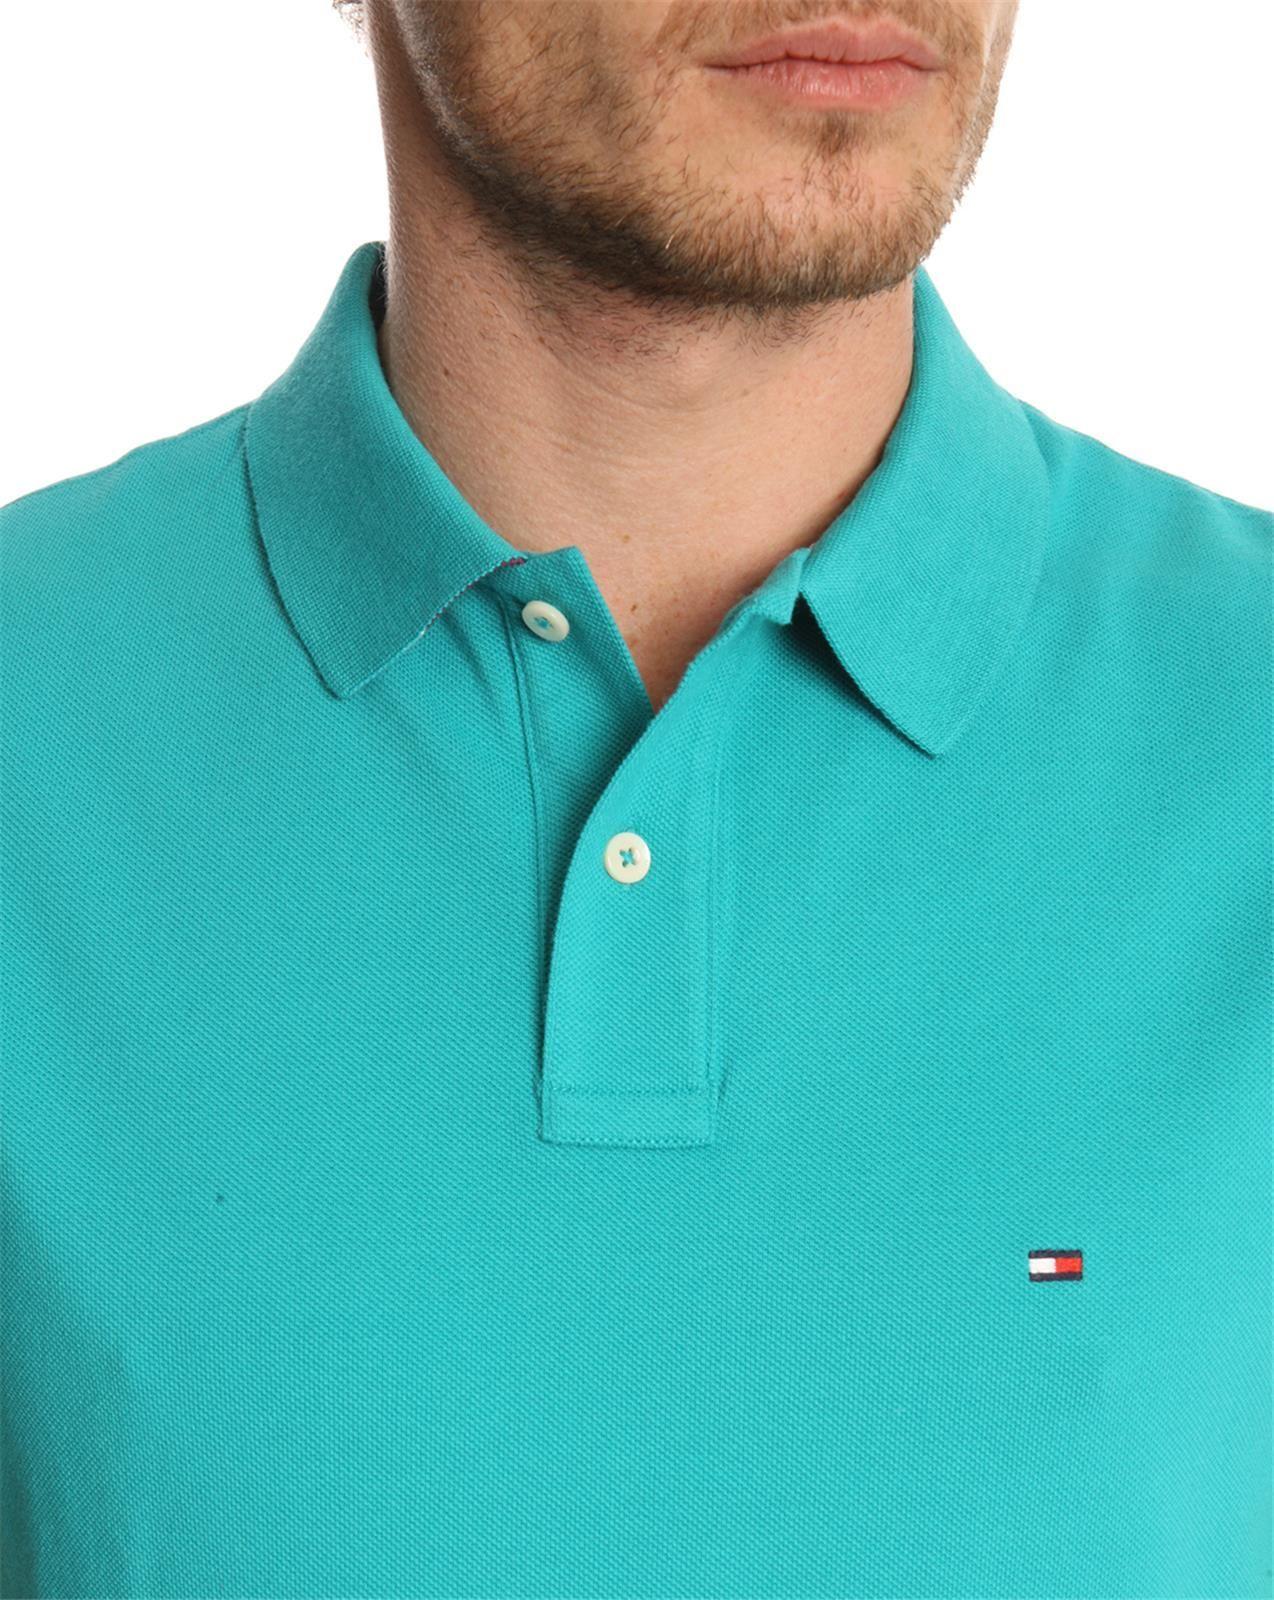 tommy hilfiger slim fit polo shirt in green for men emerald lyst. Black Bedroom Furniture Sets. Home Design Ideas